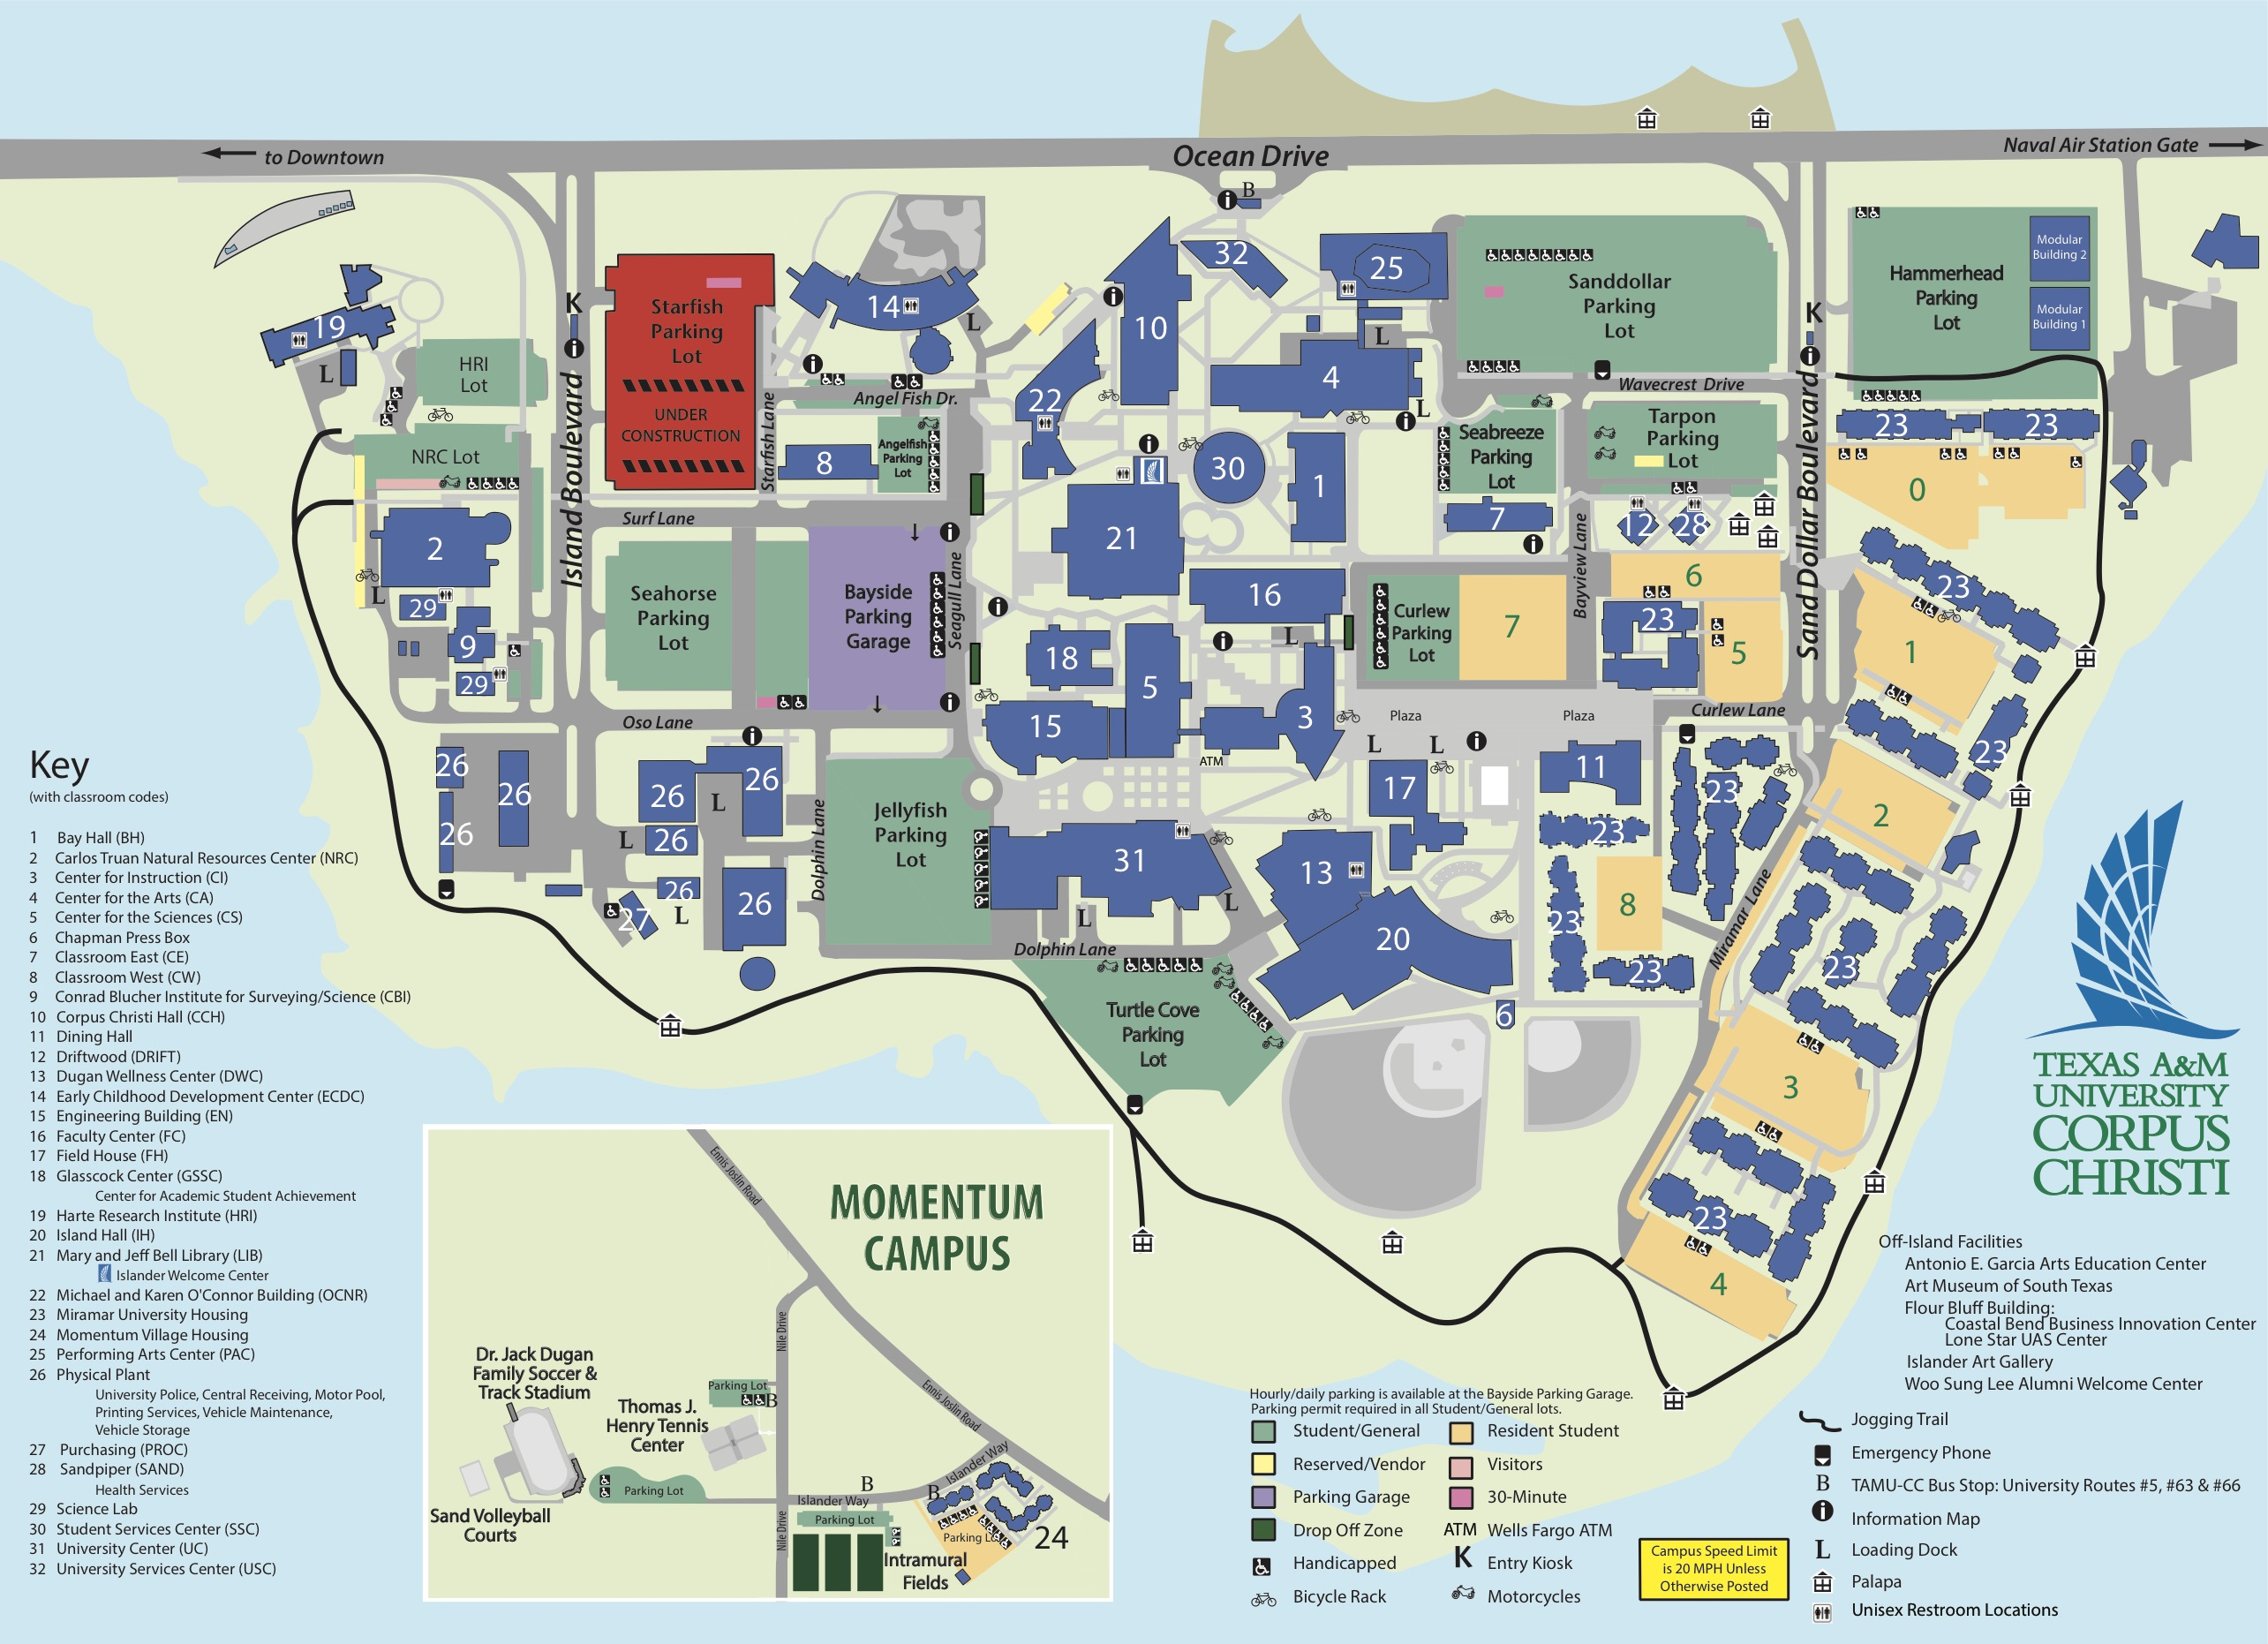 Campus Map Texas A&m University-Corpus Christi - Texas State Dorm Map